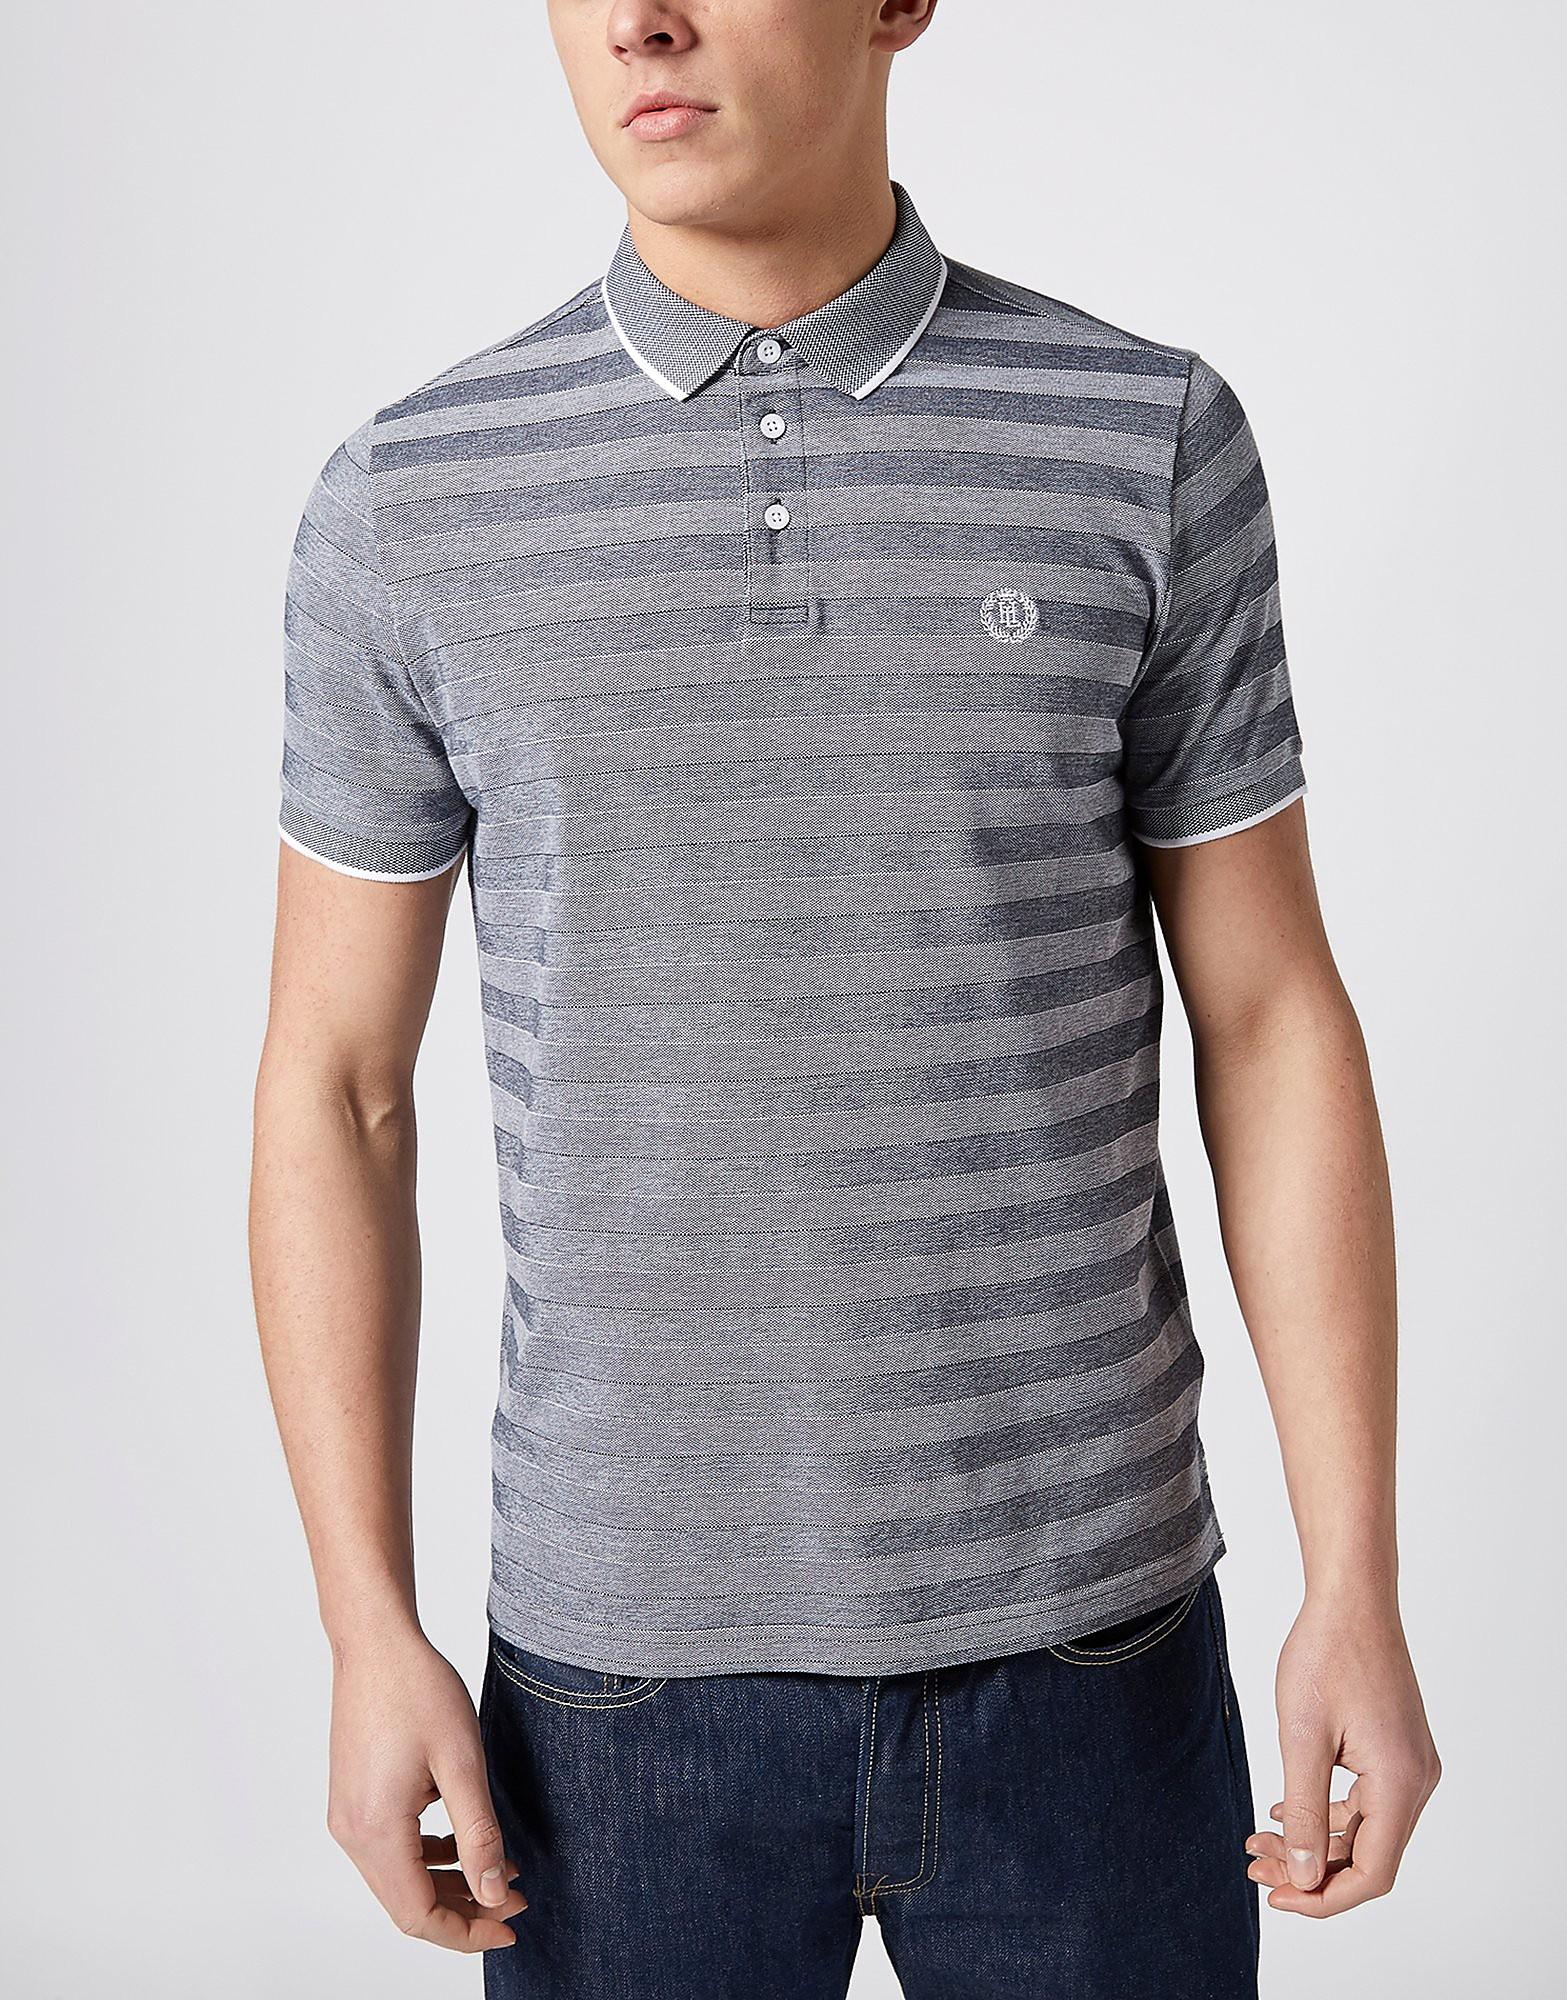 Henri Lloyd Caston Stripe Pique Polo Shirt